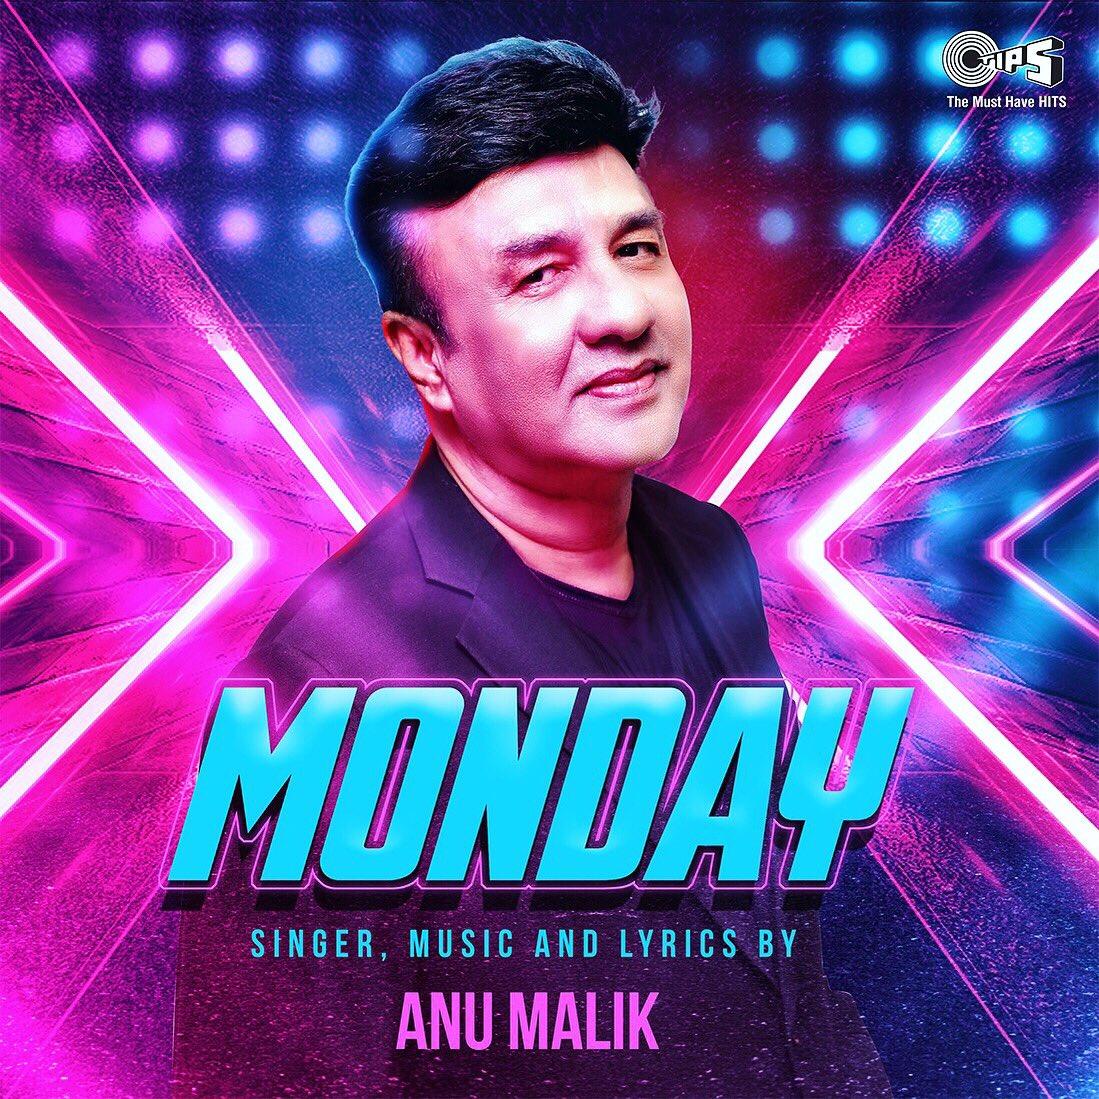 Anu Malik: Mondays hi acche hote hai yaar, Mondays se karna seekho pyaar. Yeh dekho mera NAYA GAAN...